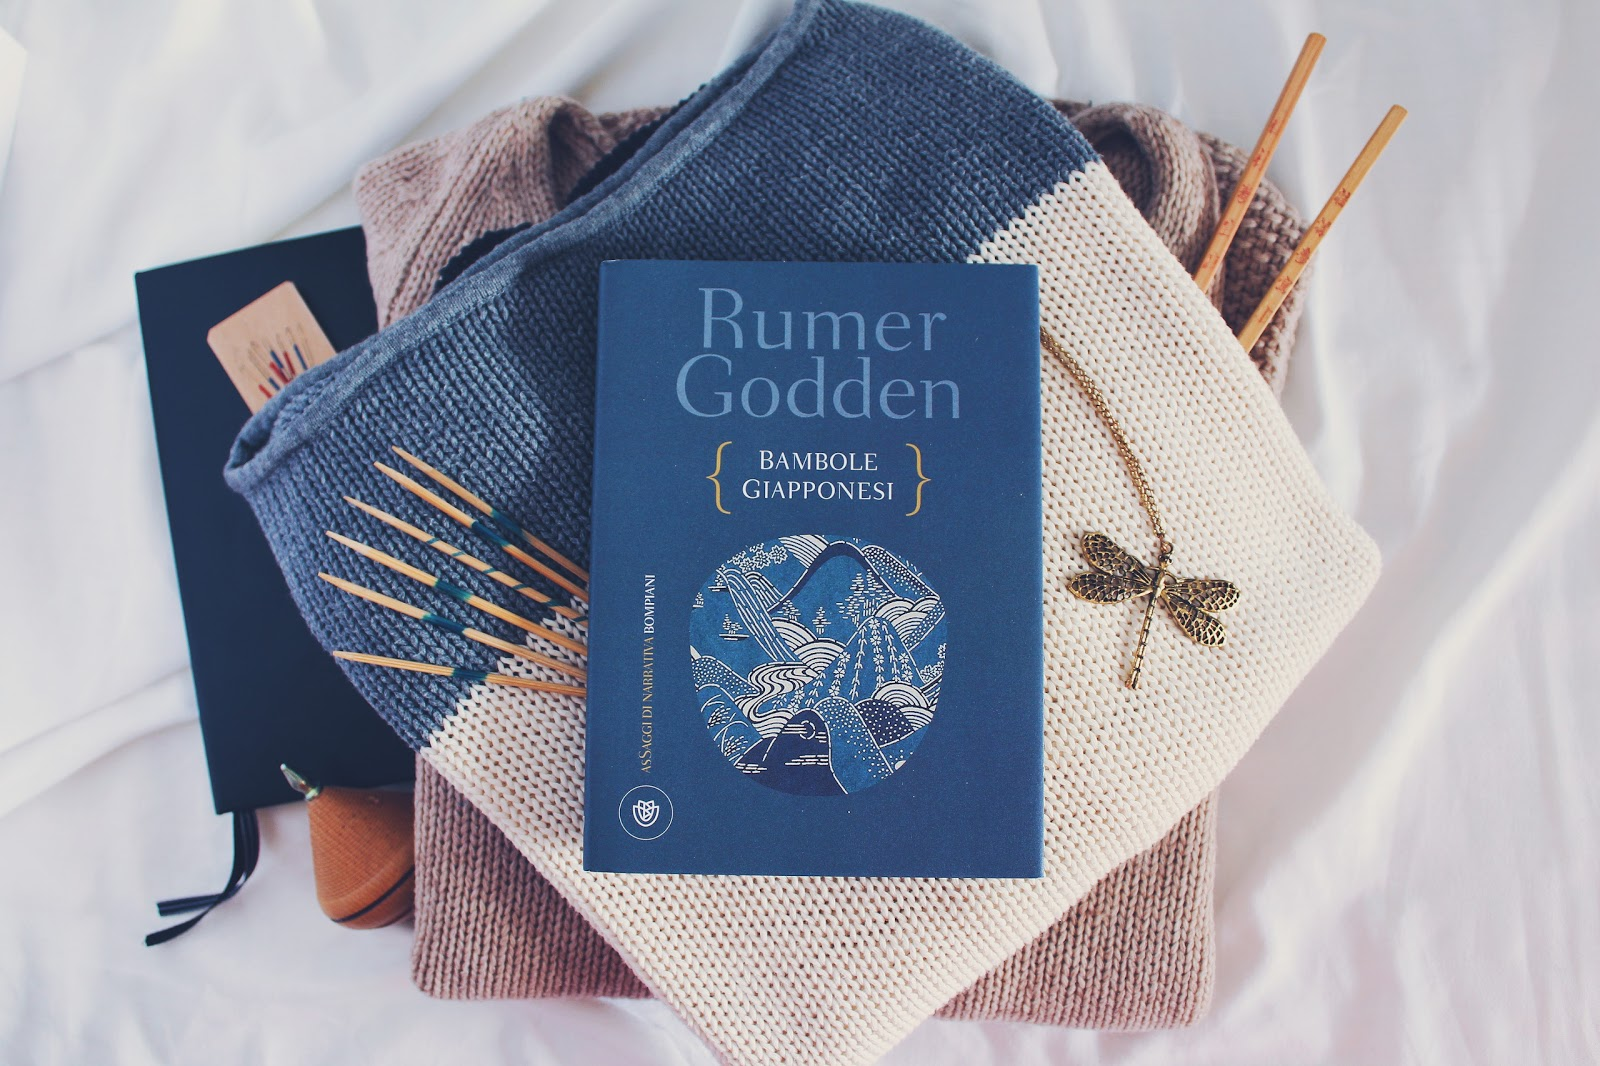 Bambole giapponesi di Rumer Godden